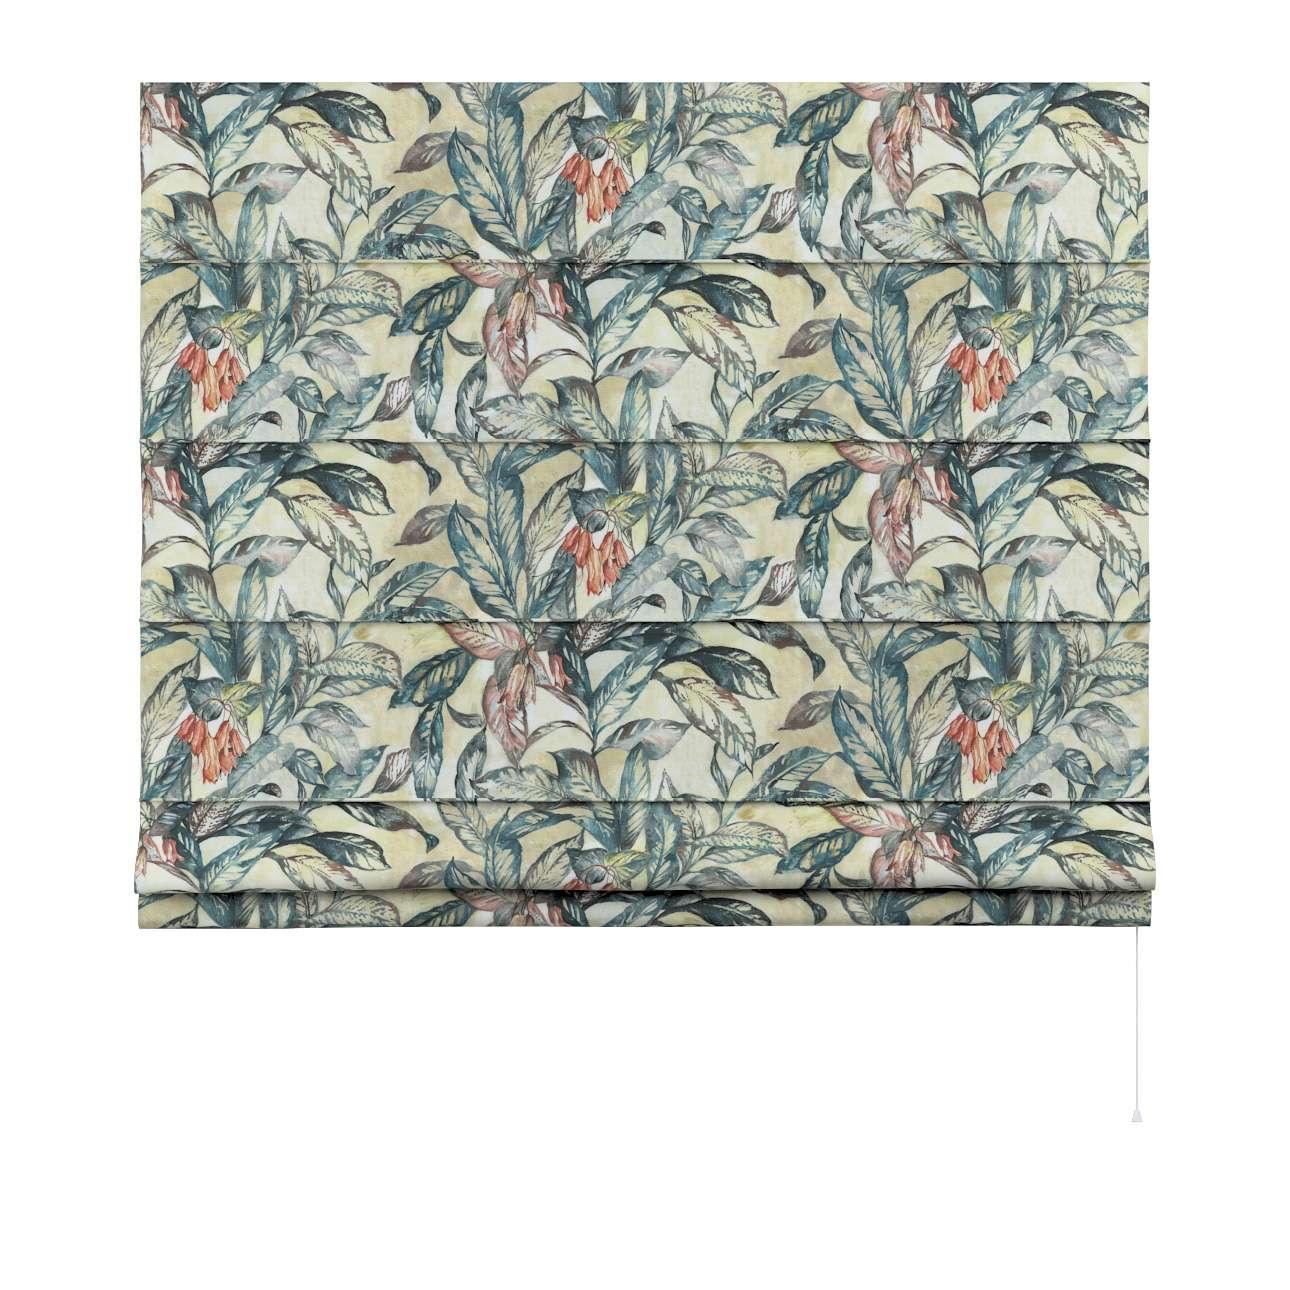 Rímska roleta Capri V kolekcii Abigail, tkanina: 143-08